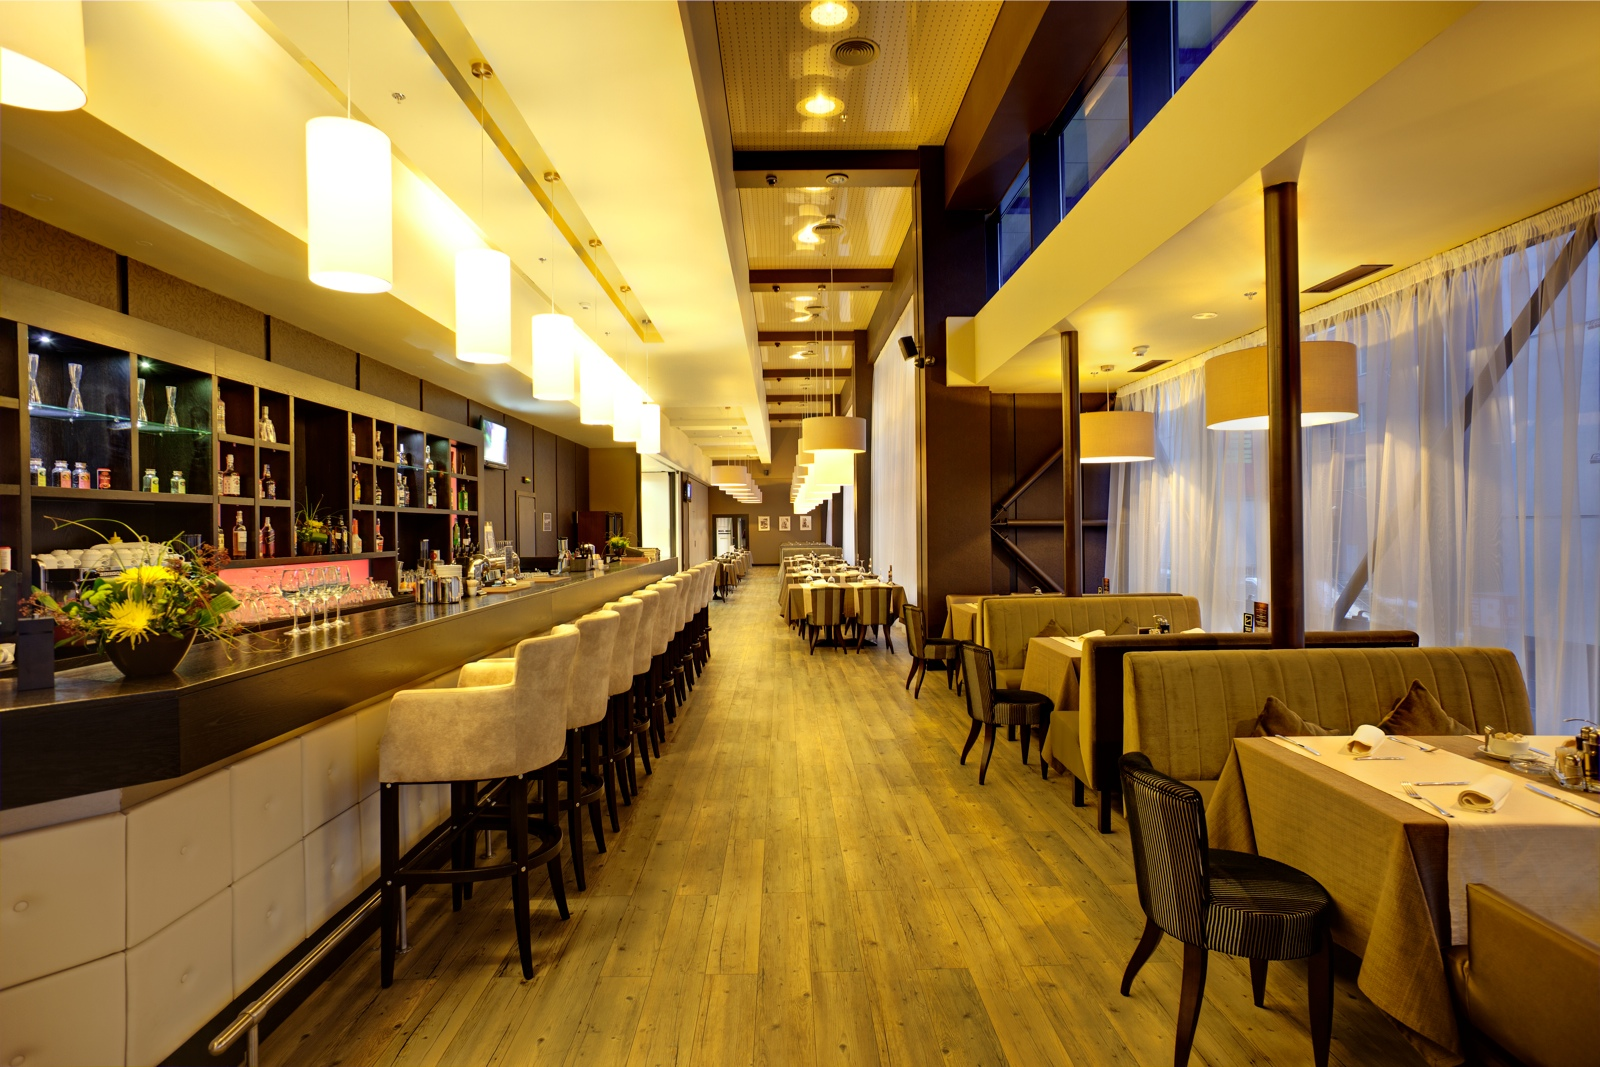 381257924675414493 additionally Restaurant Christian Tetedoie 46 further 15734 furthermore Buddha Bar Vilaga also 358317714084022965. on restaurant in kiev